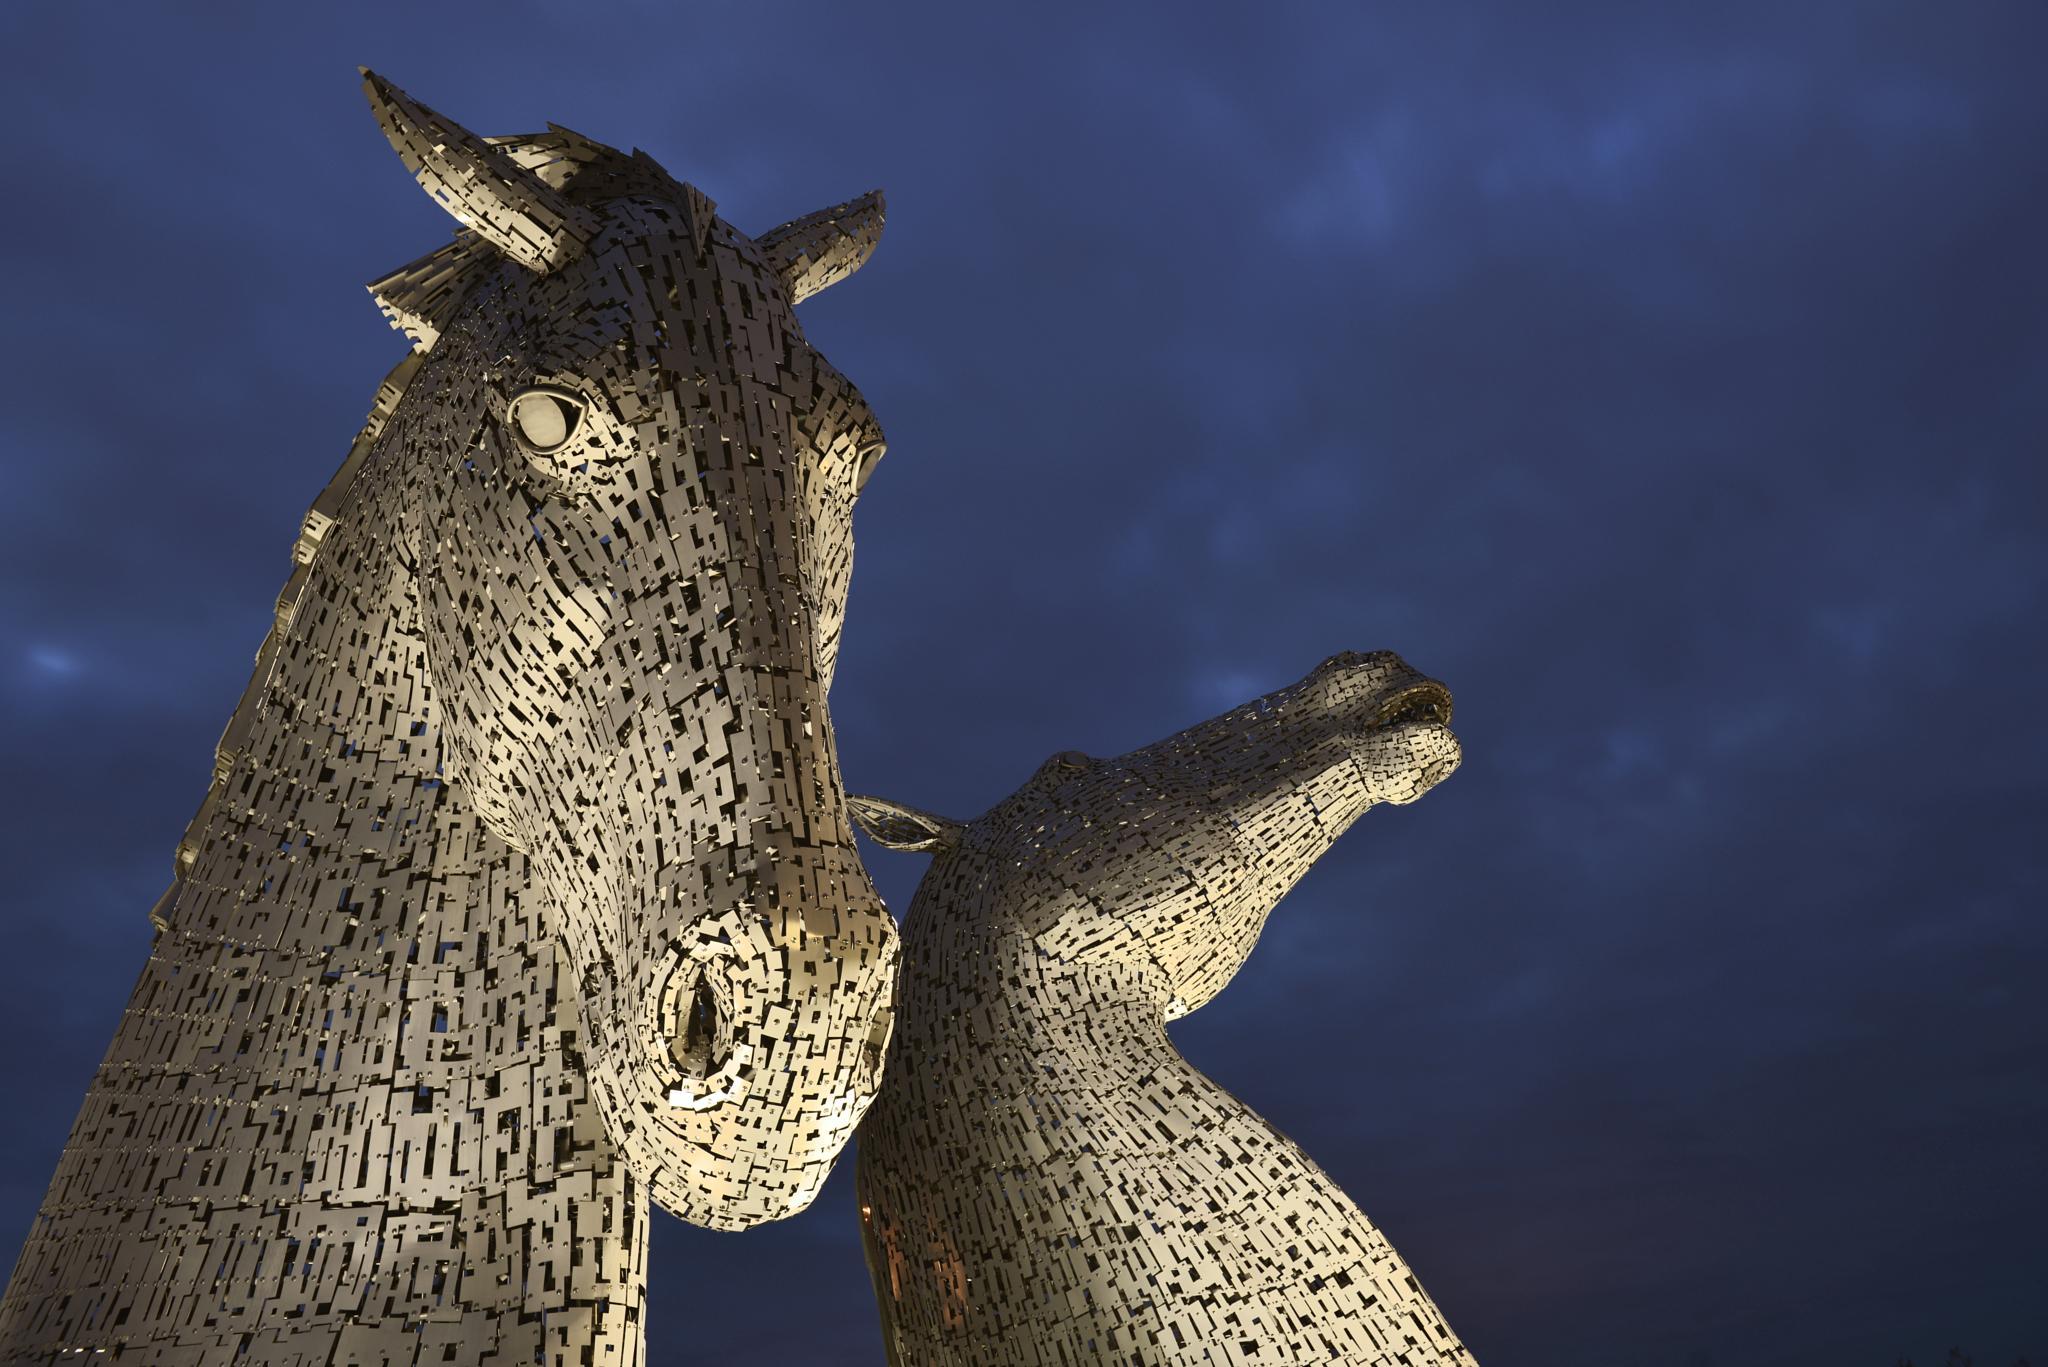 The Kelpies by Andy Scott, Falkirk, Scotland by Ann